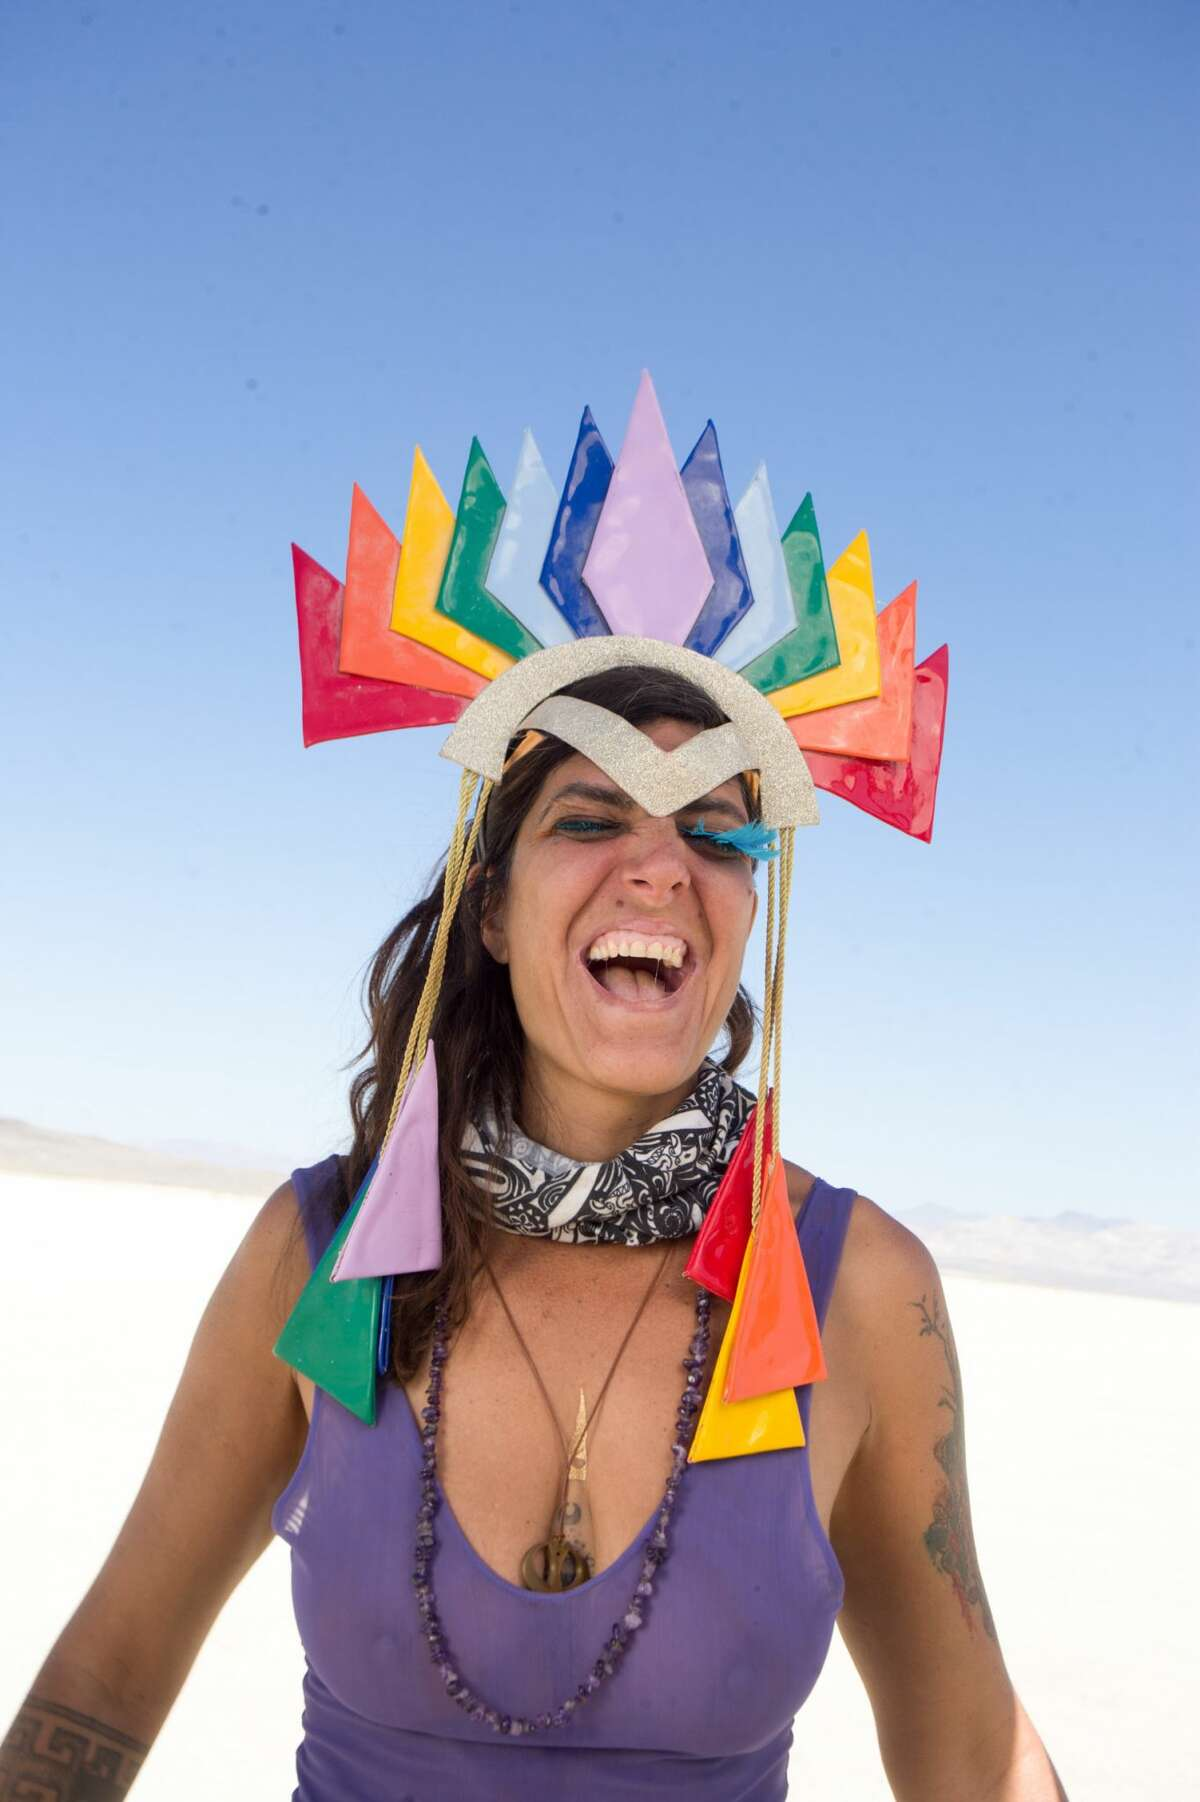 Romina Linderman, a Brazilian social entreprenuer, at Burning Man 2018.